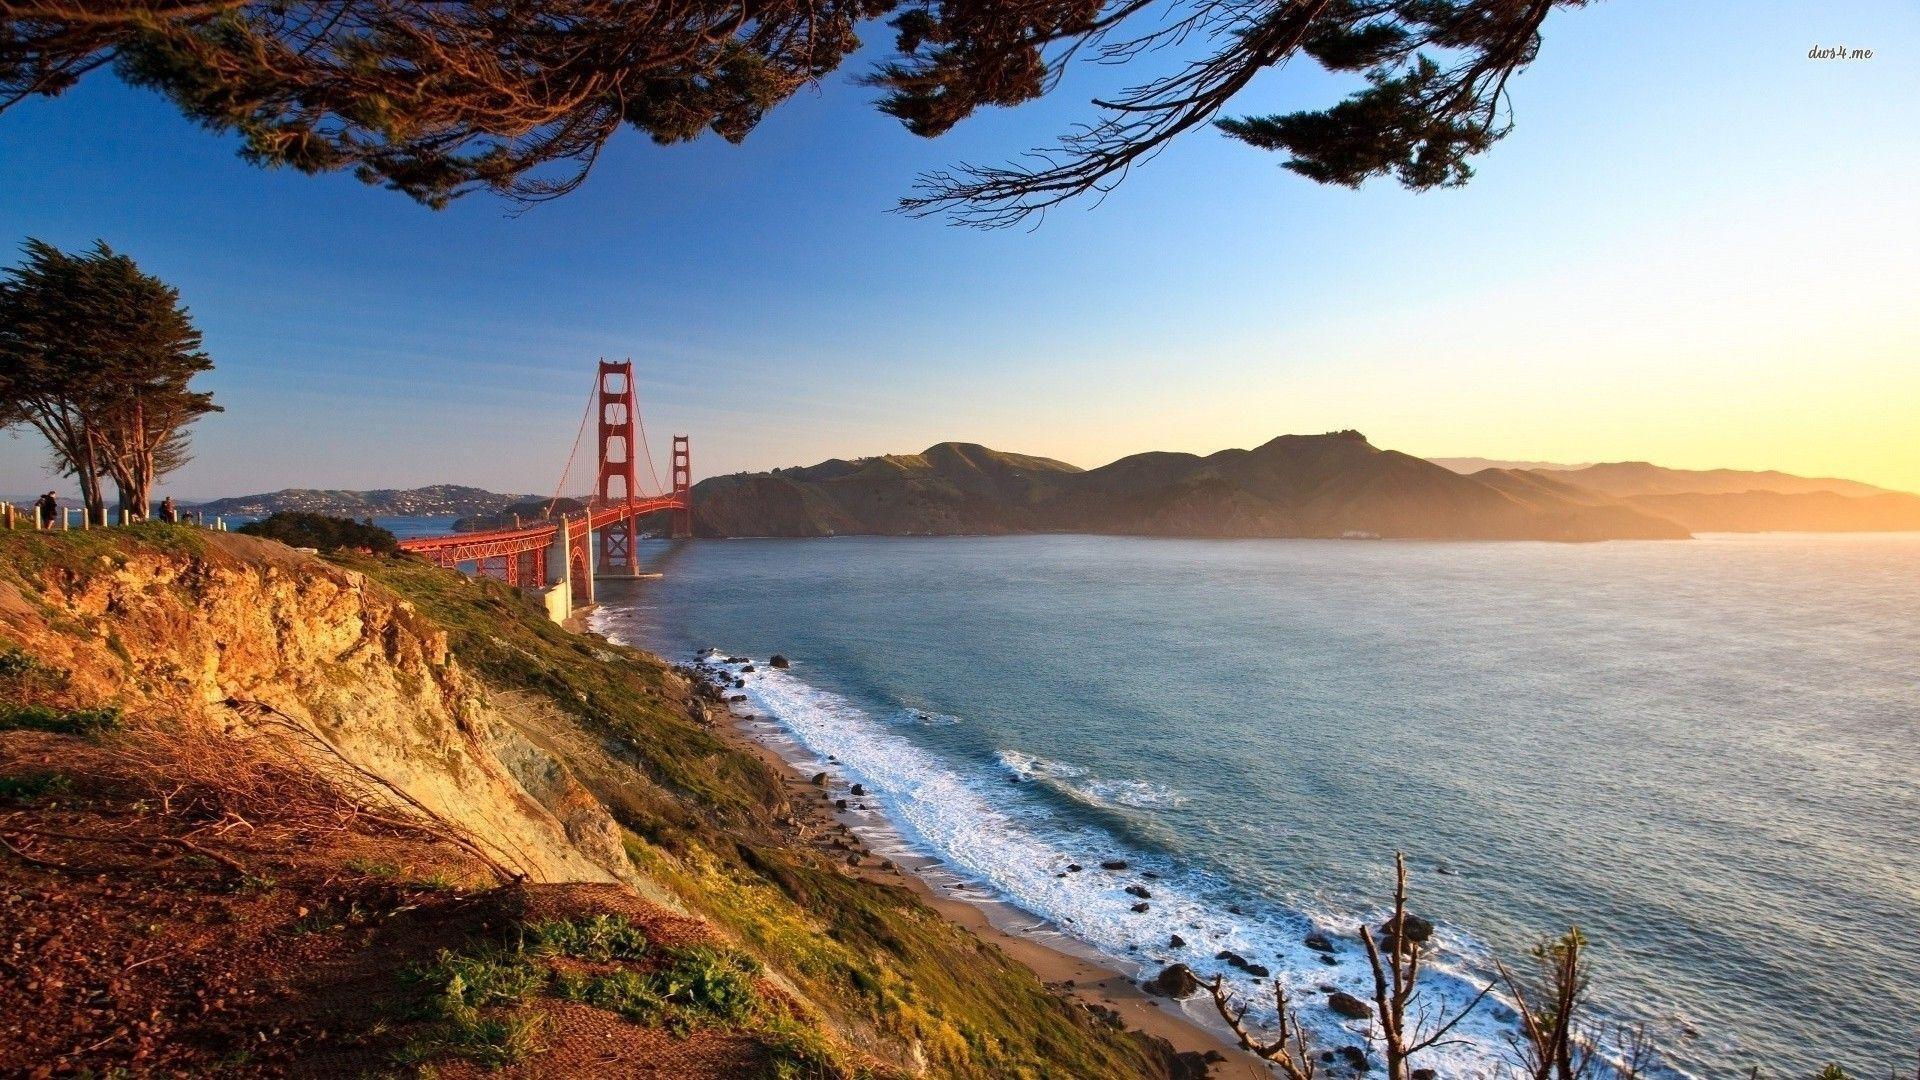 Hd Wallpapers Golden Gate Bridge 3456 X 1999 2263 Kb Jpeg | HD ...